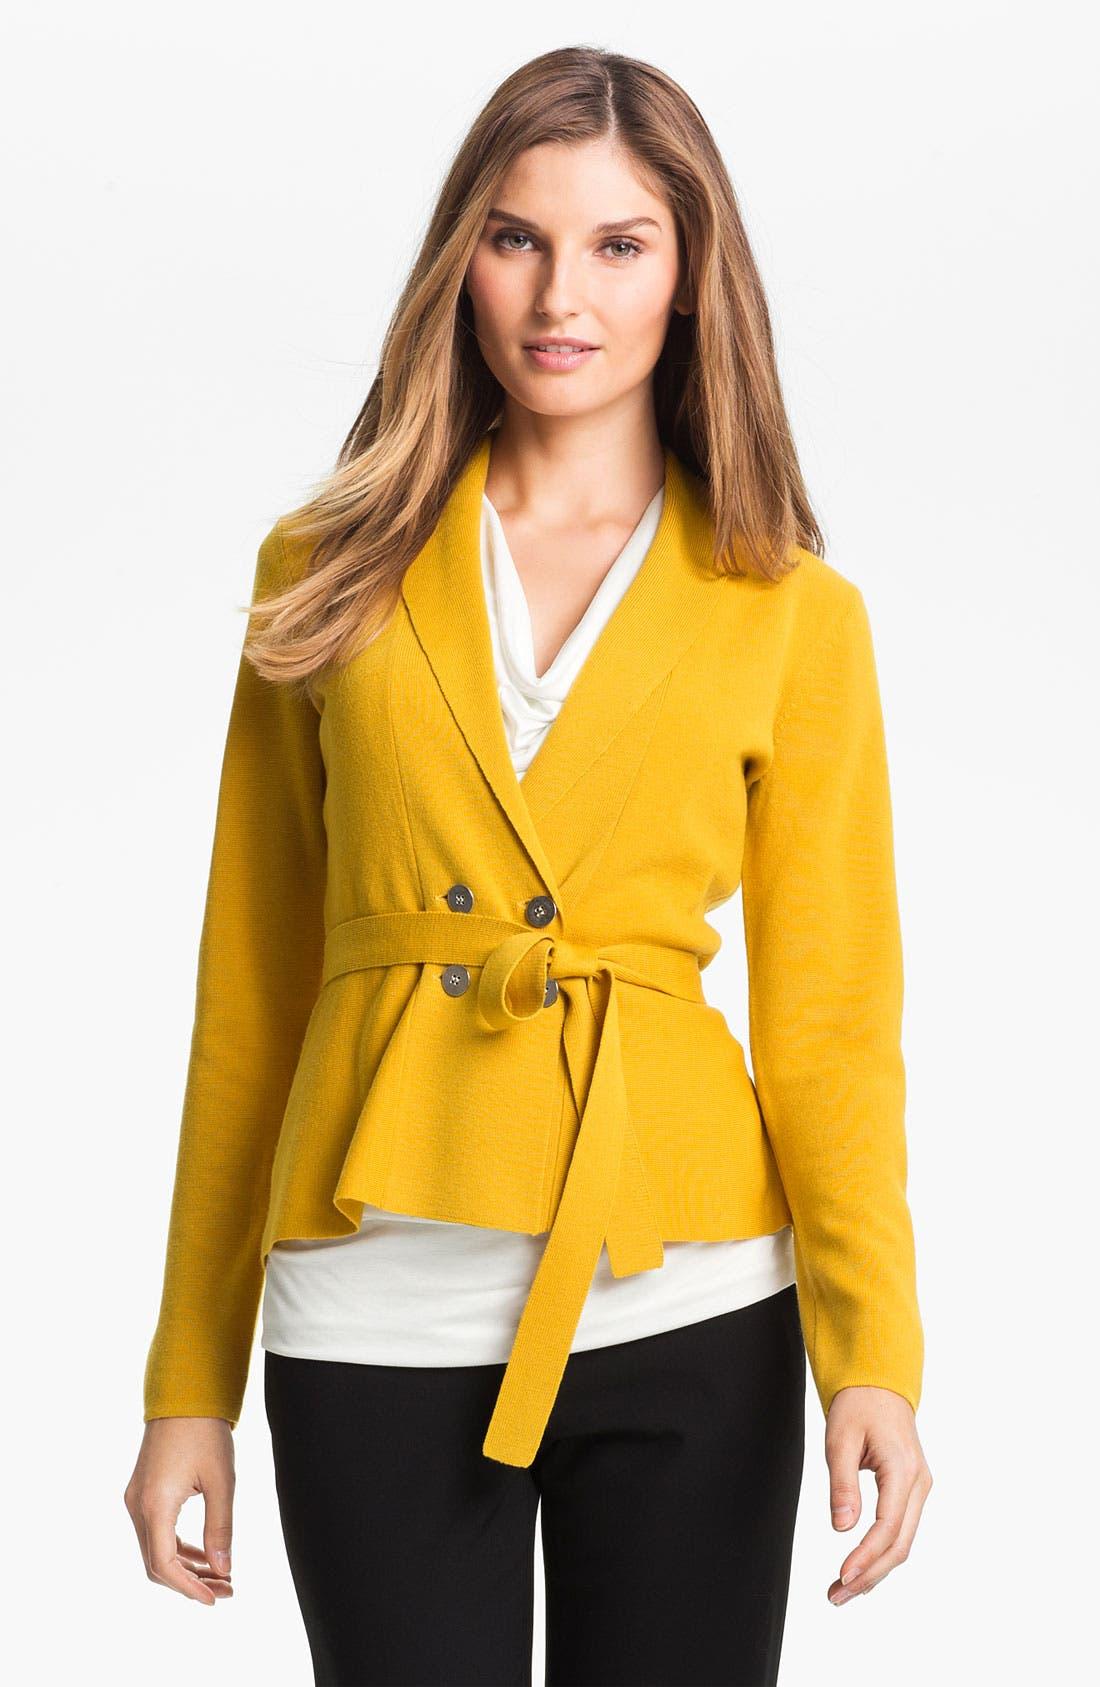 Alternate Image 1 Selected - Classiques Entier® Peplum Sweater Jacket